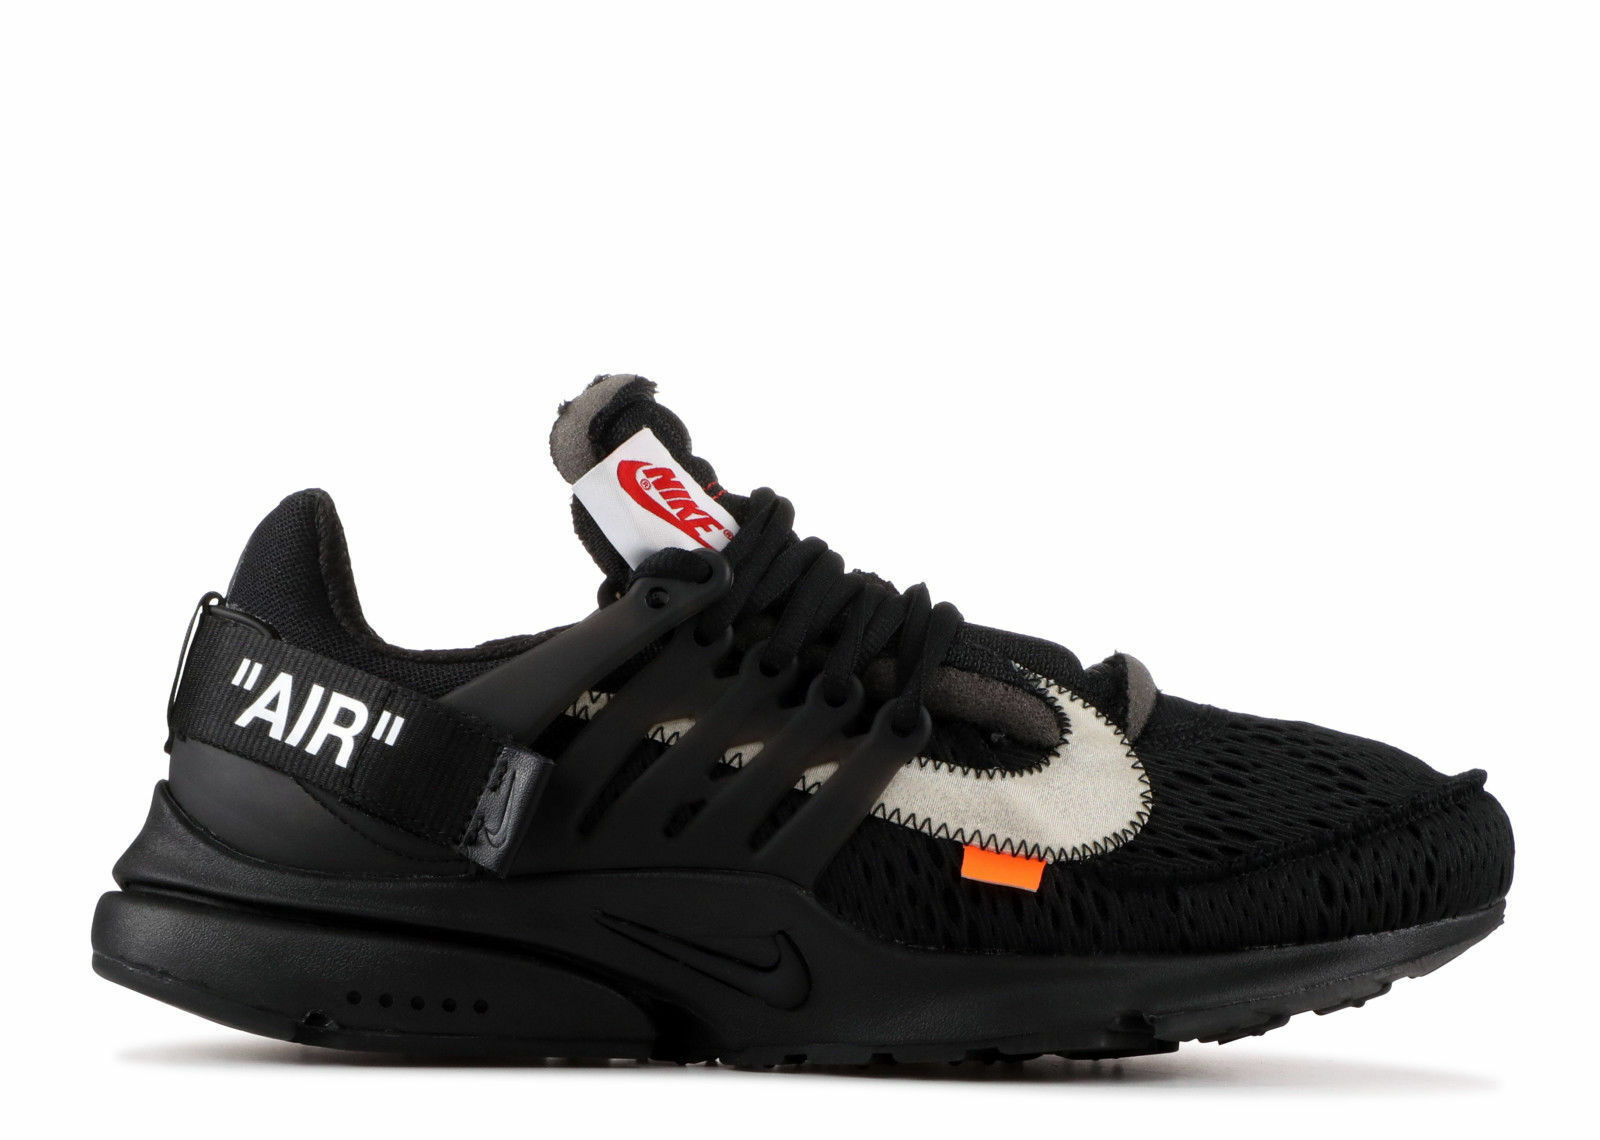 Nike Nike Nike Air presto blanco negro marca de descuento aa3830-002 comodo dd6137